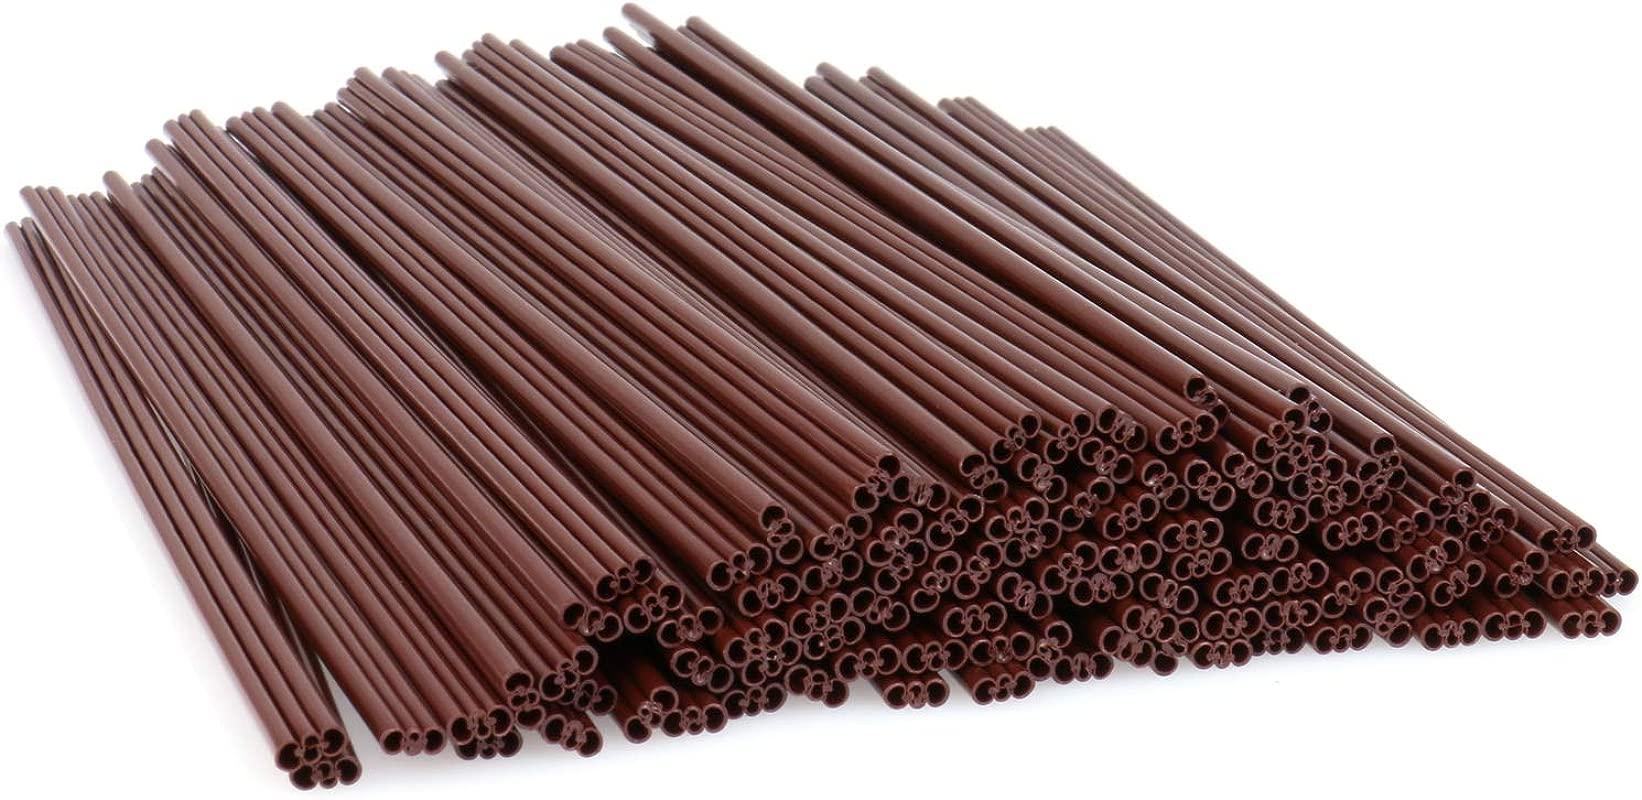 Coffee Stir Sticks 6 7 Inch Disposable Plastic Coffee Stirrer Straw 100ct